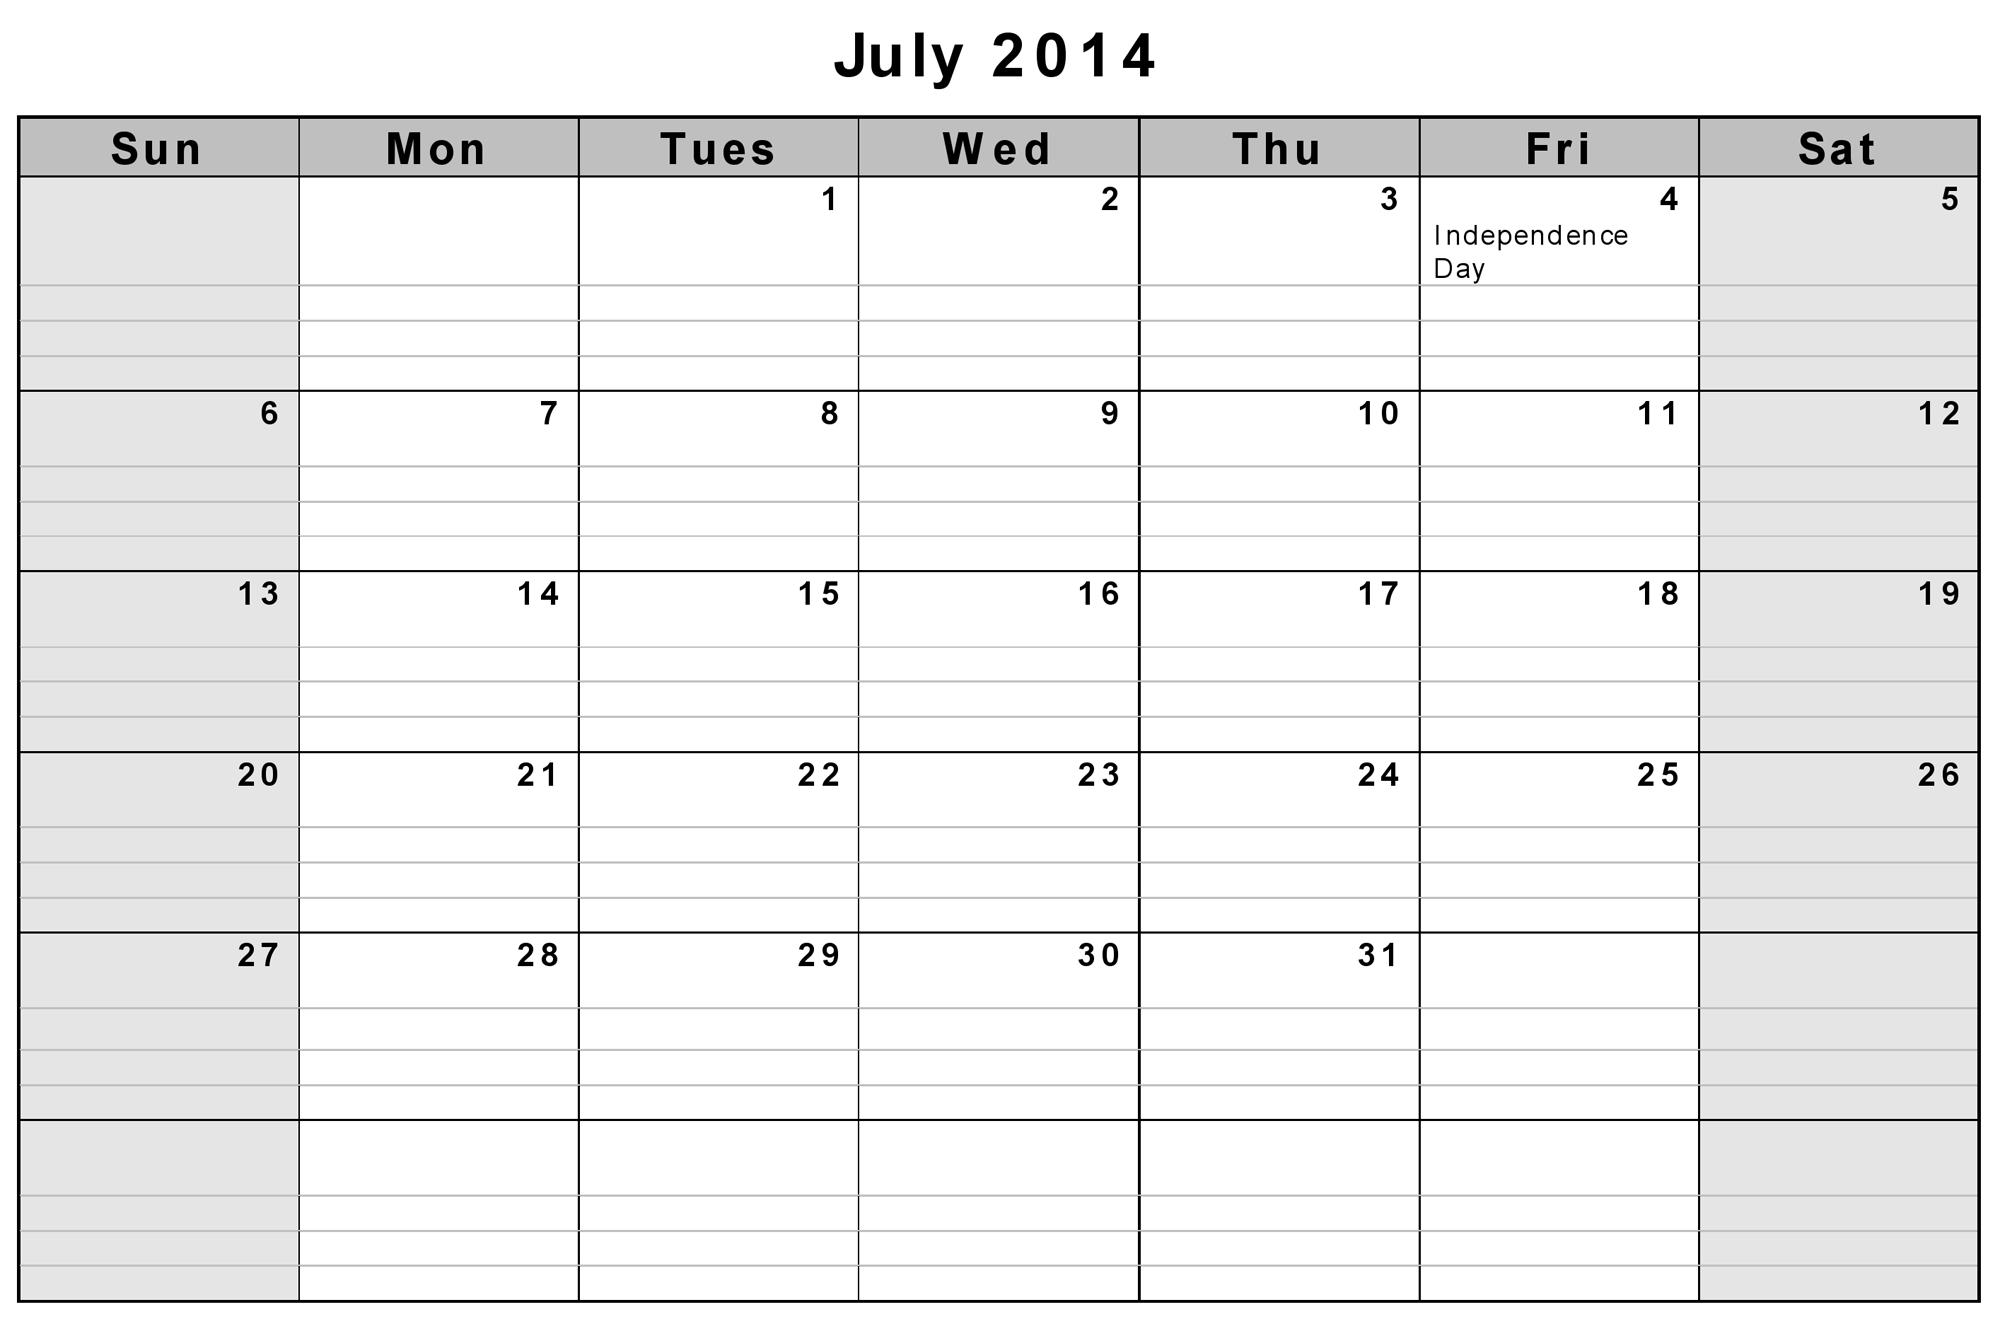 Calendar July 2014 Printable | galleryhip.com - The Hippest Galleries!